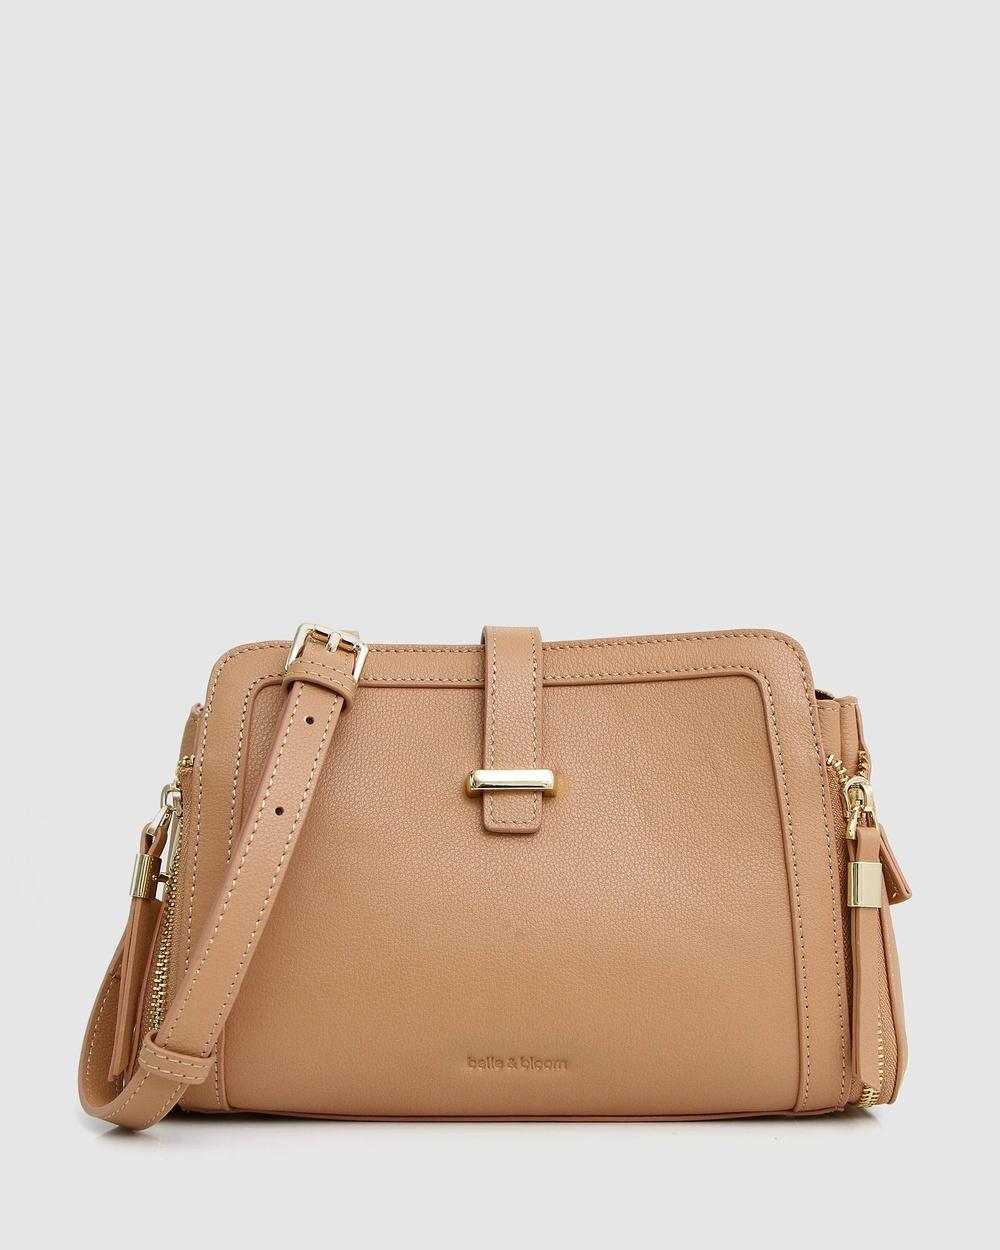 Belle & Bloom Your Girl Cross Body Bag Bags Beige Cross-Body Australia